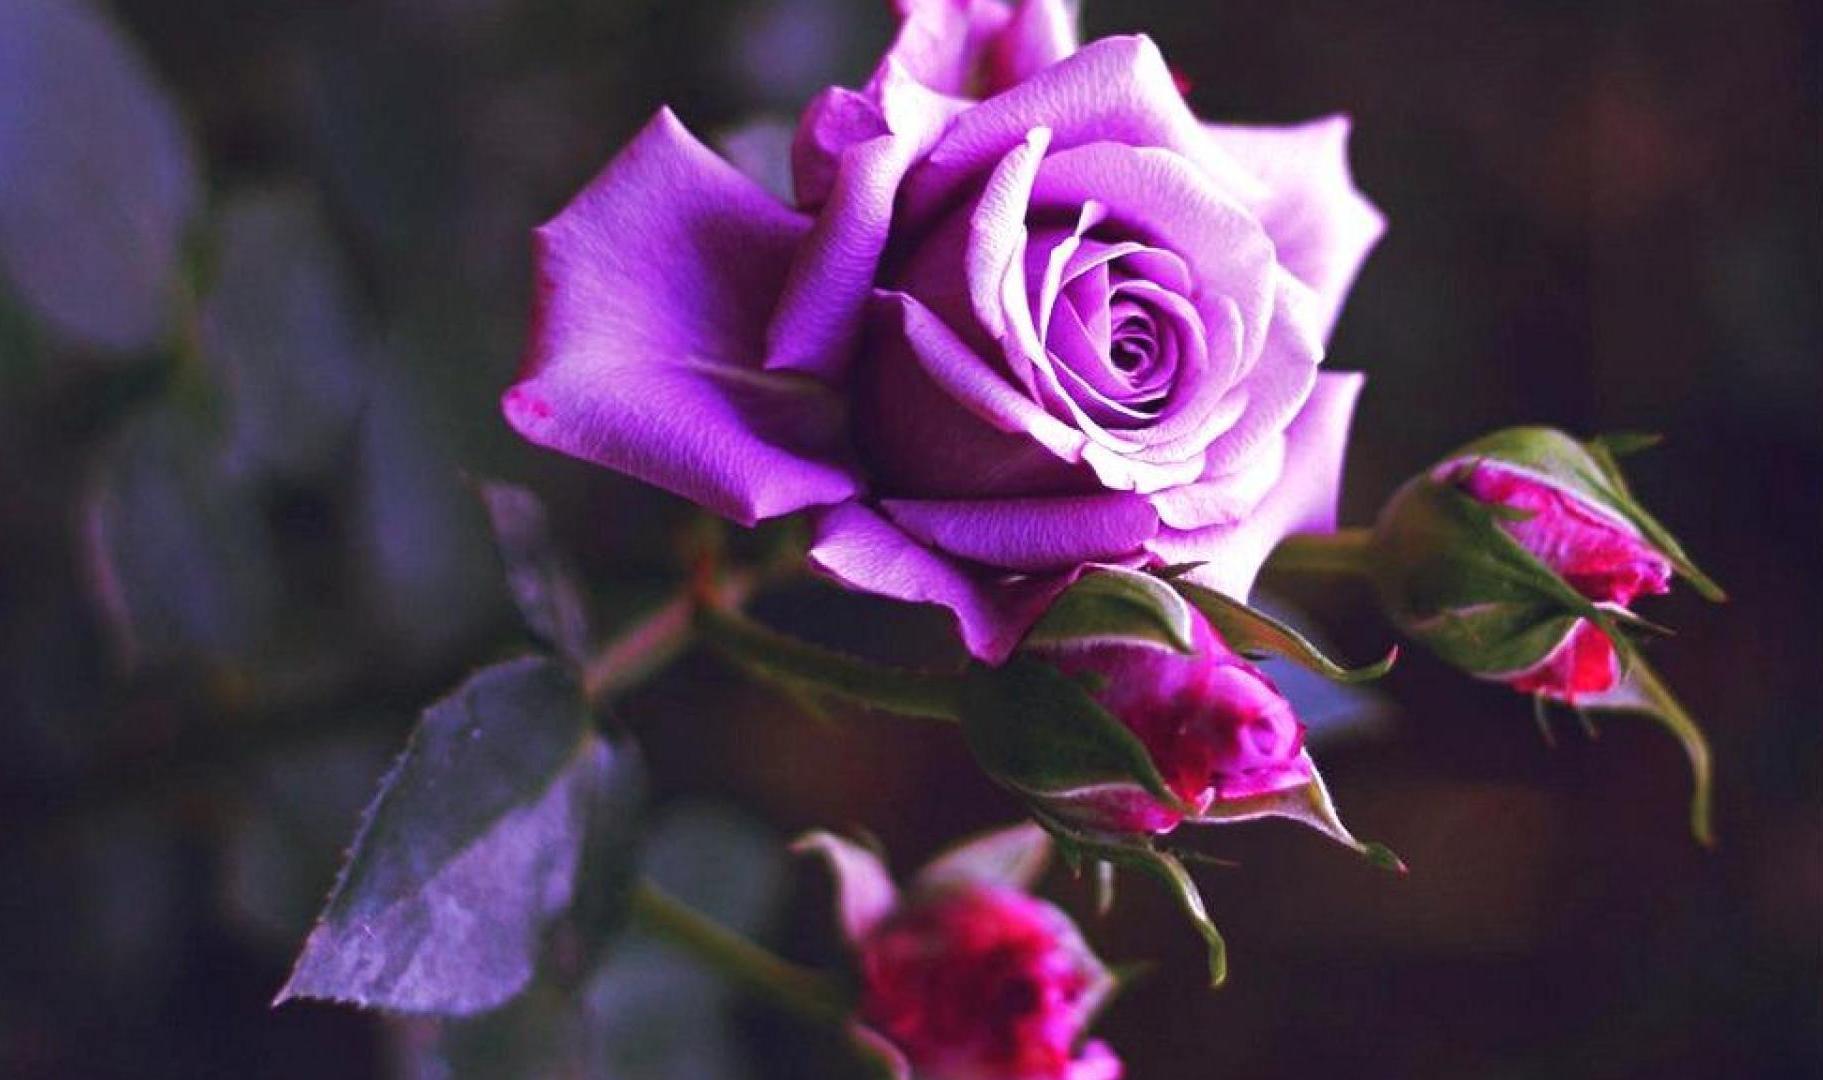 красивая сиреневая роза фото своими руками